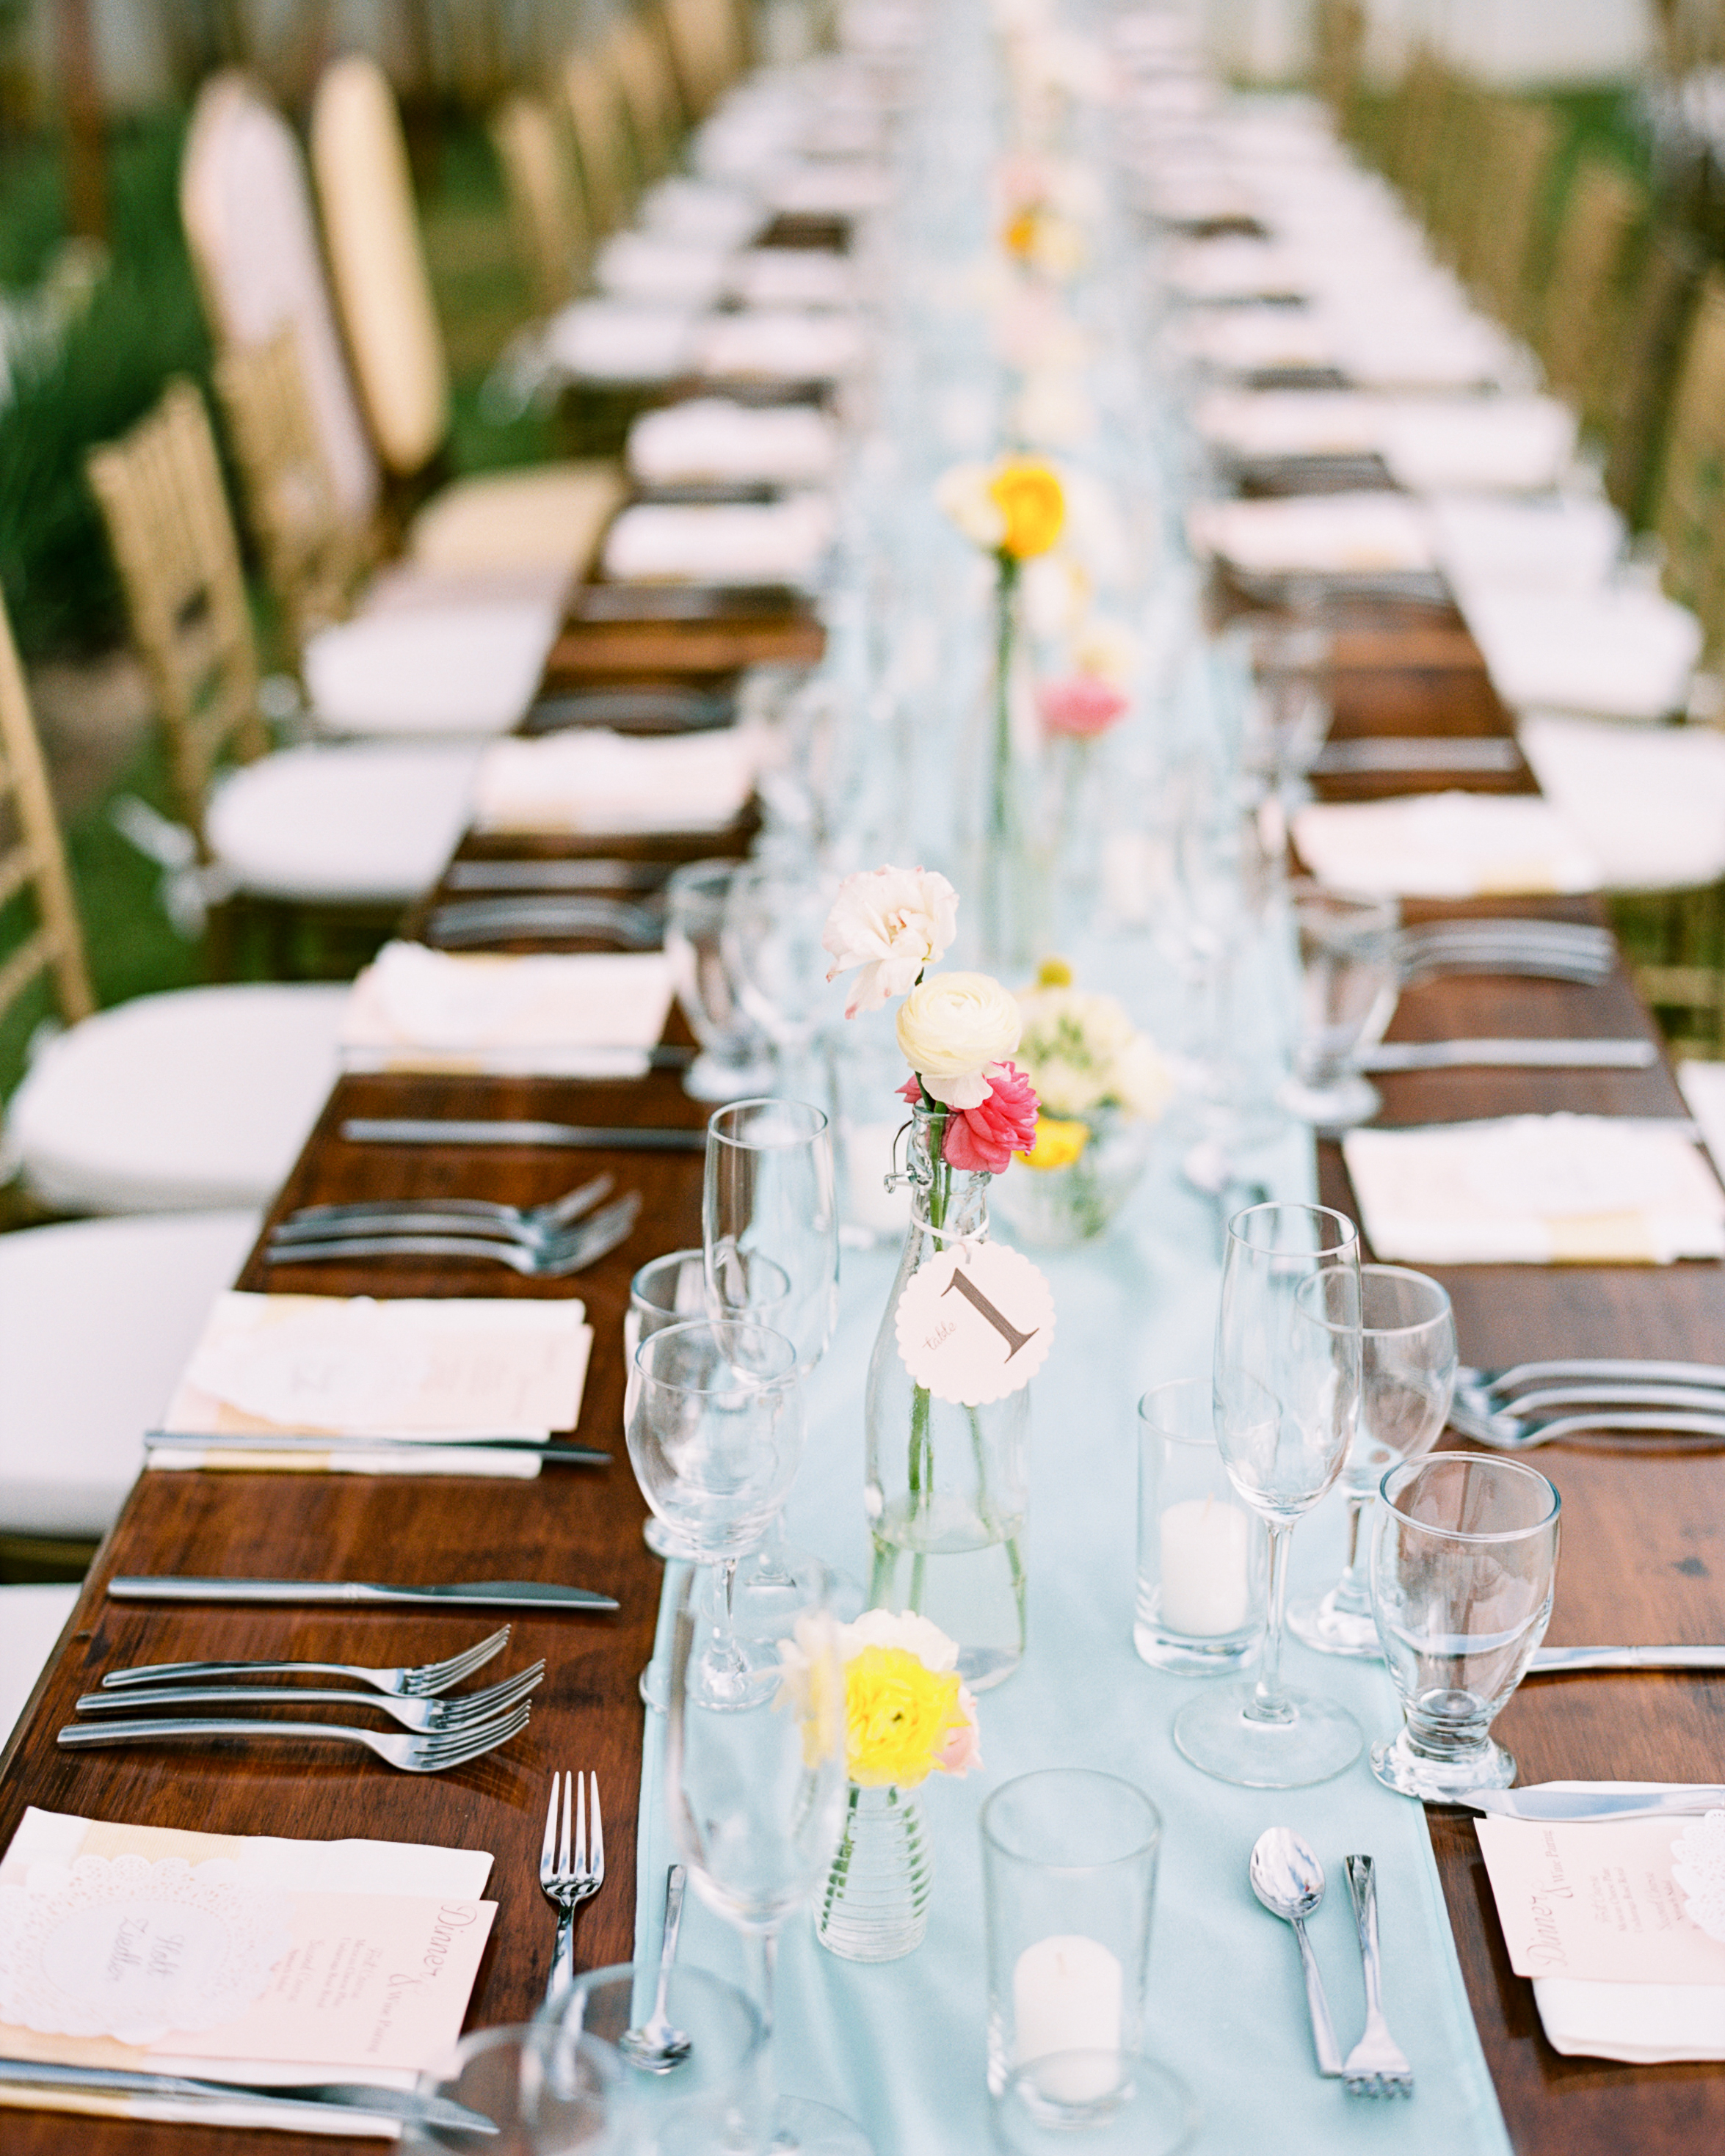 molly-nate-wedding-table-036-s111479-0814.jpg